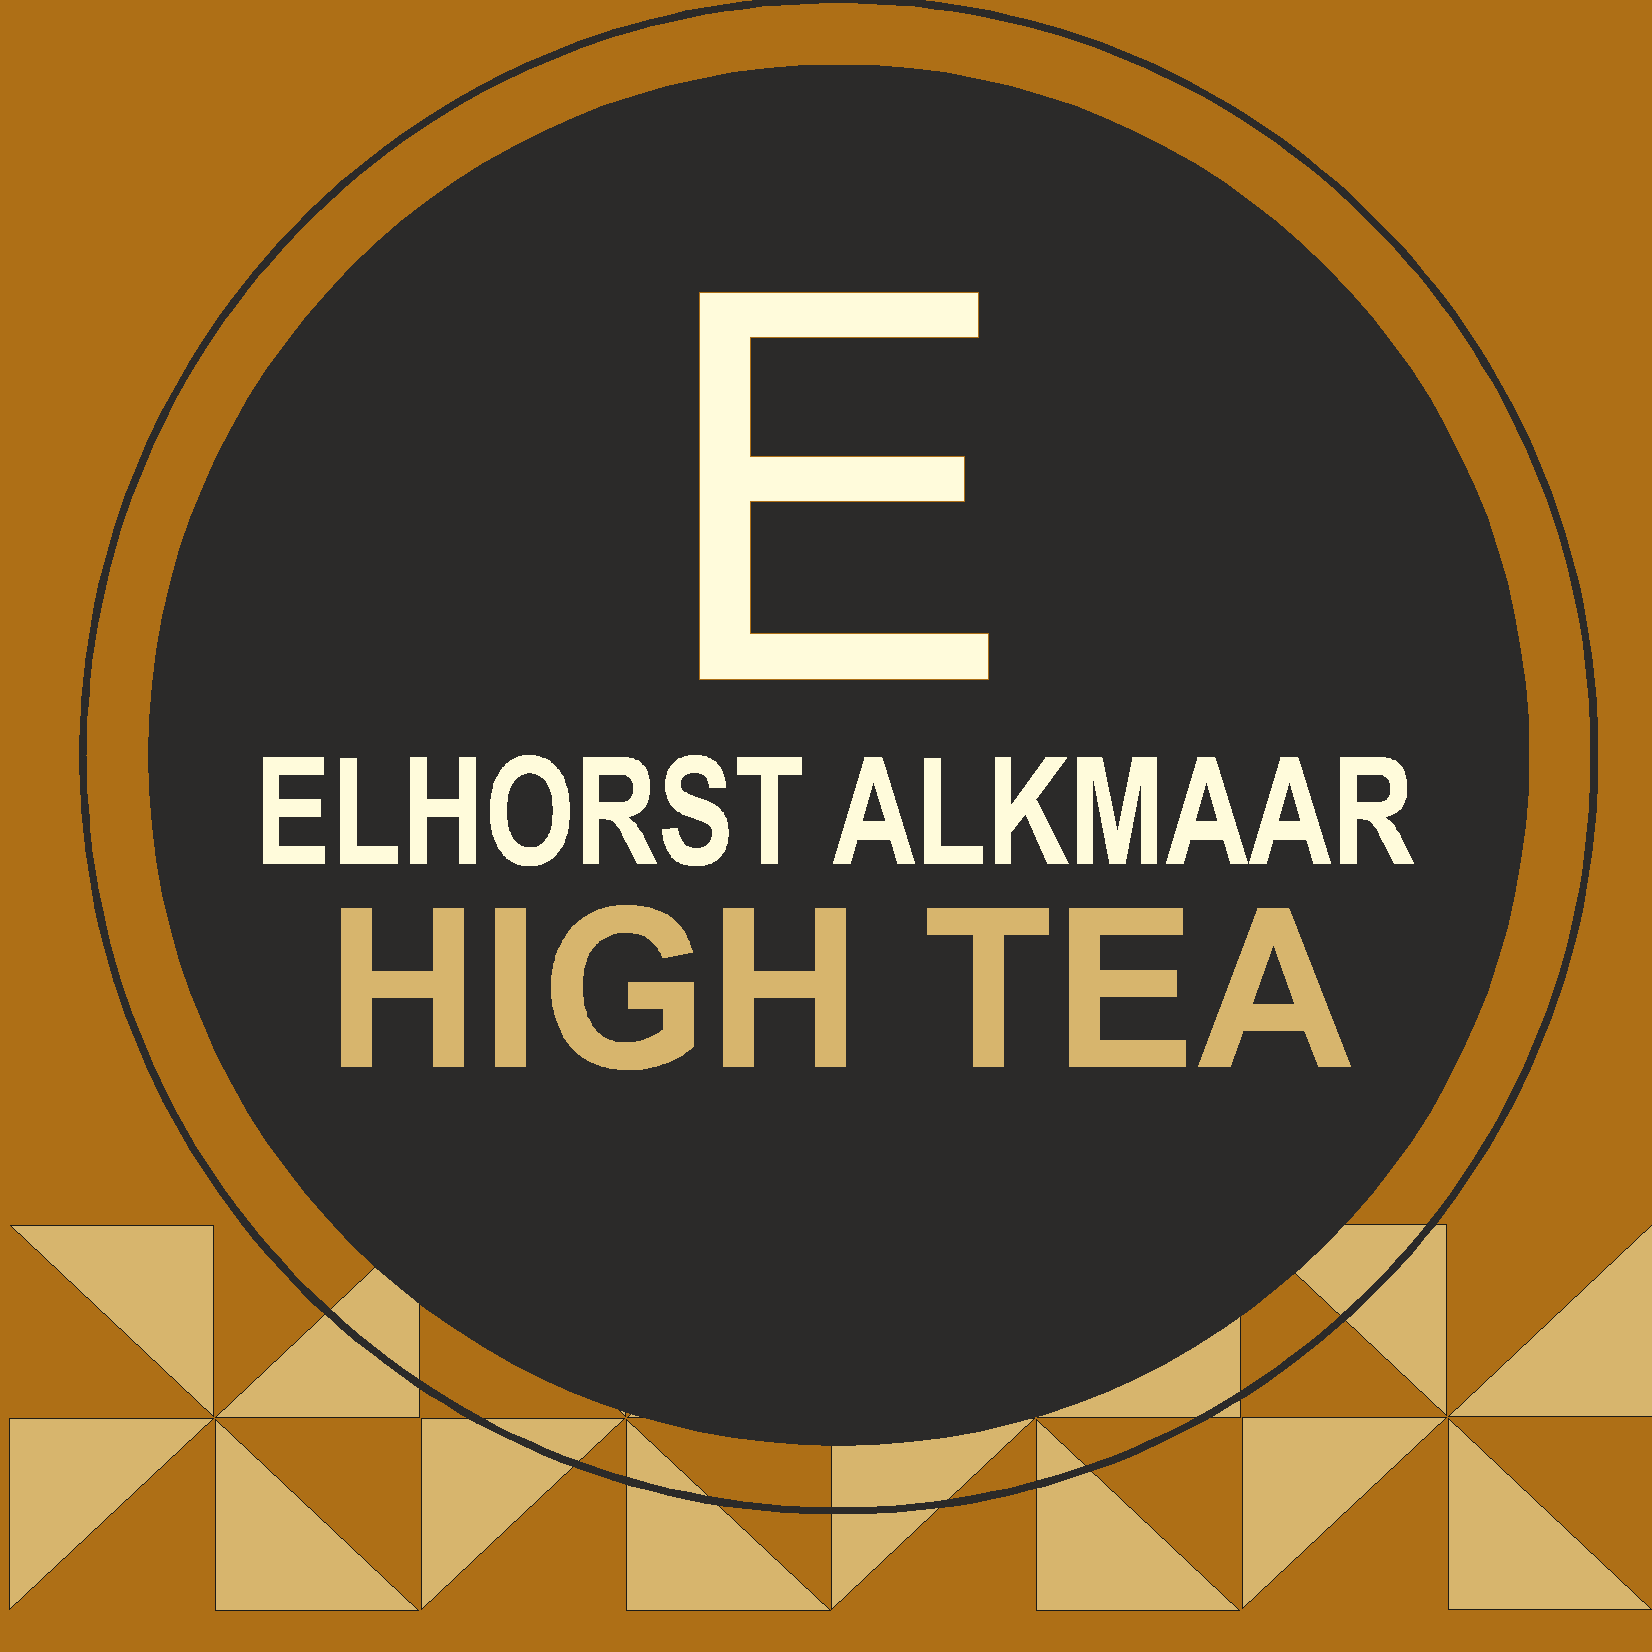 hightea-elhorst-alkmaar